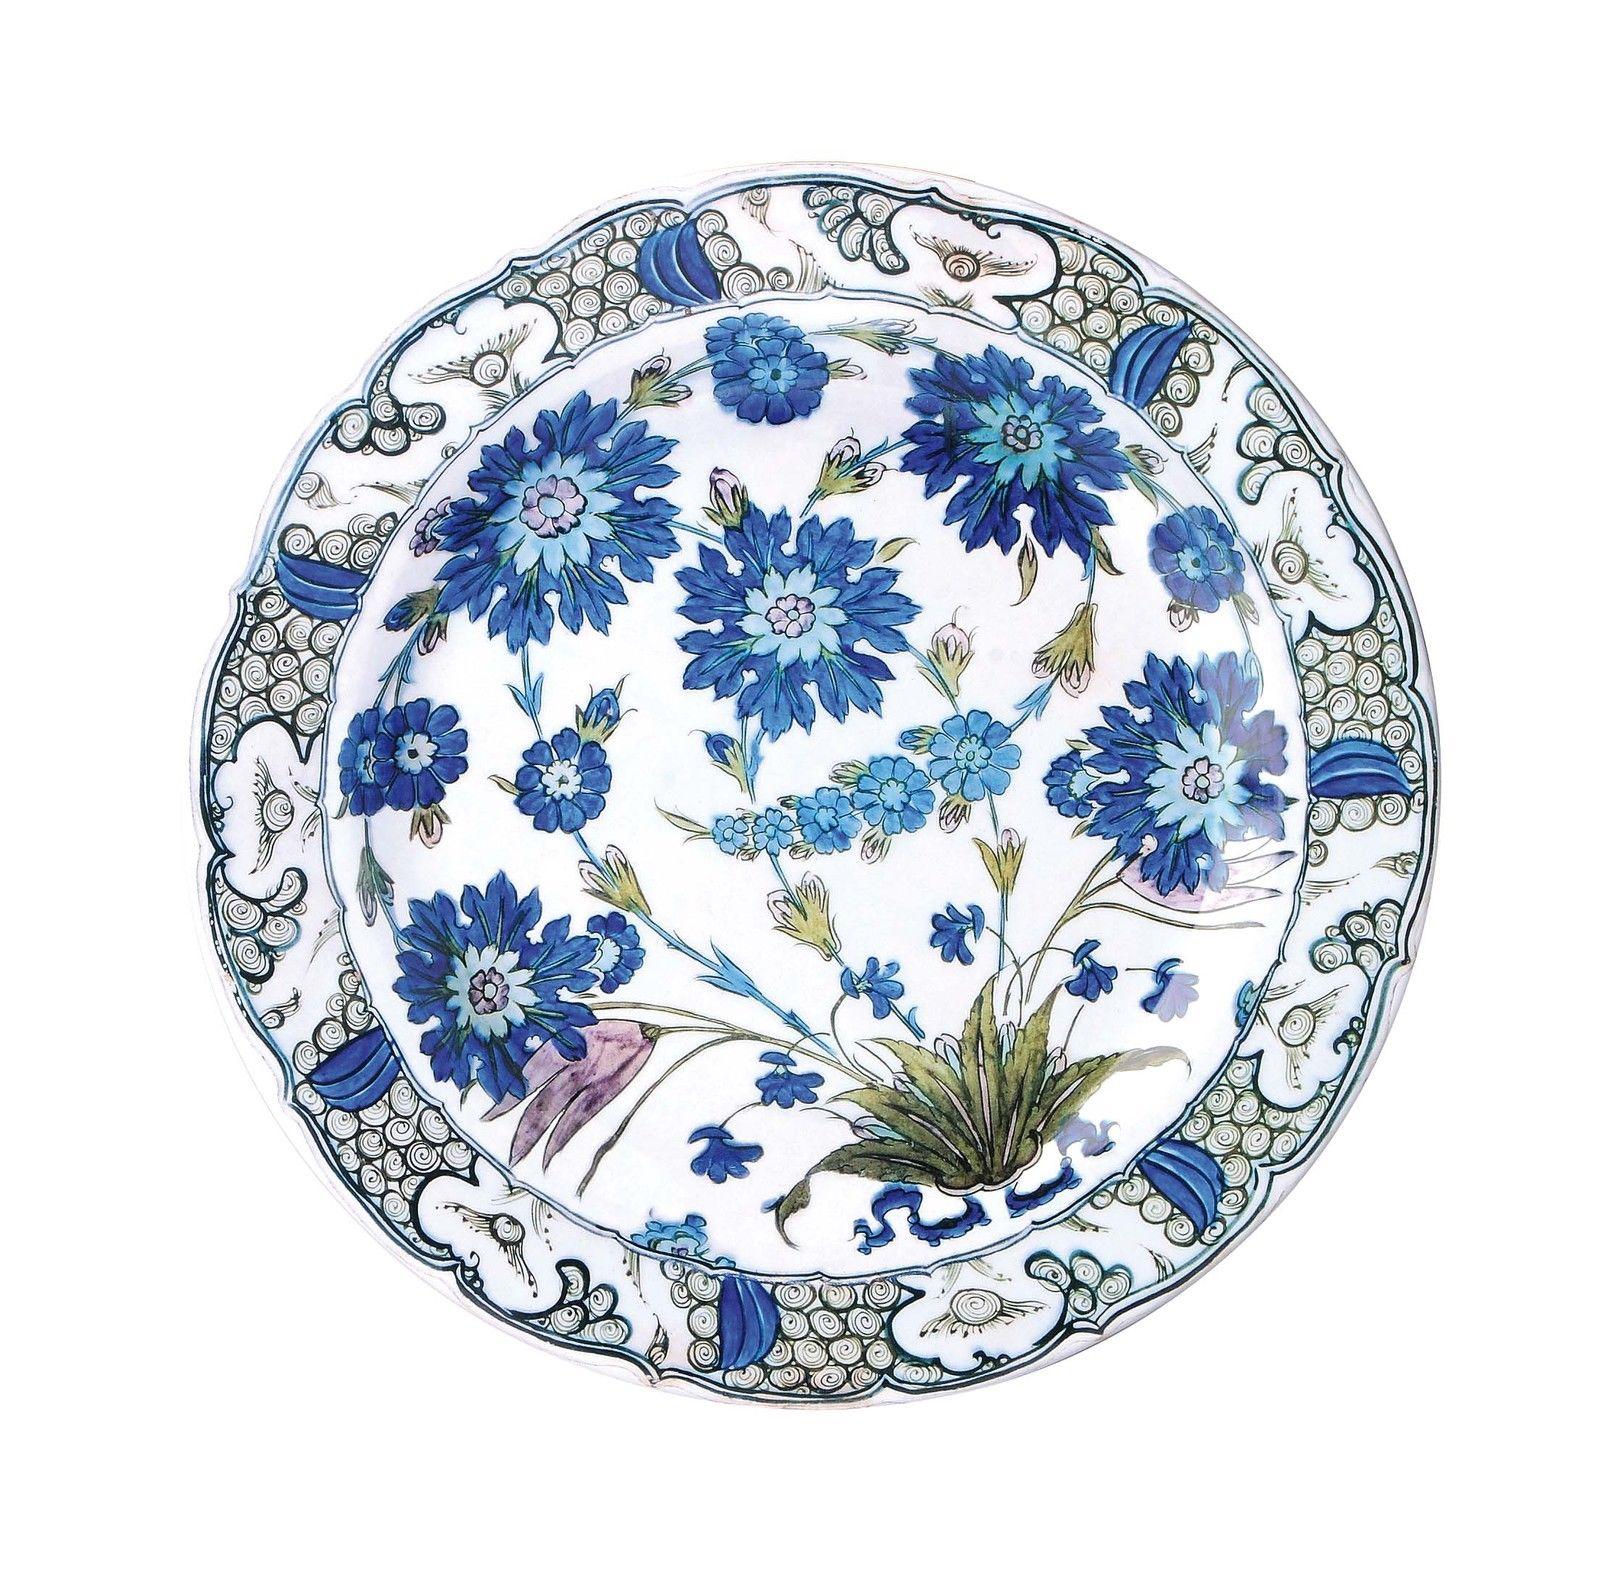 Museum Collection Floral Tin Enamel Plates  sc 1 st  The English Room & Museum Collection Floral Tin Enamel Plates | The English Room